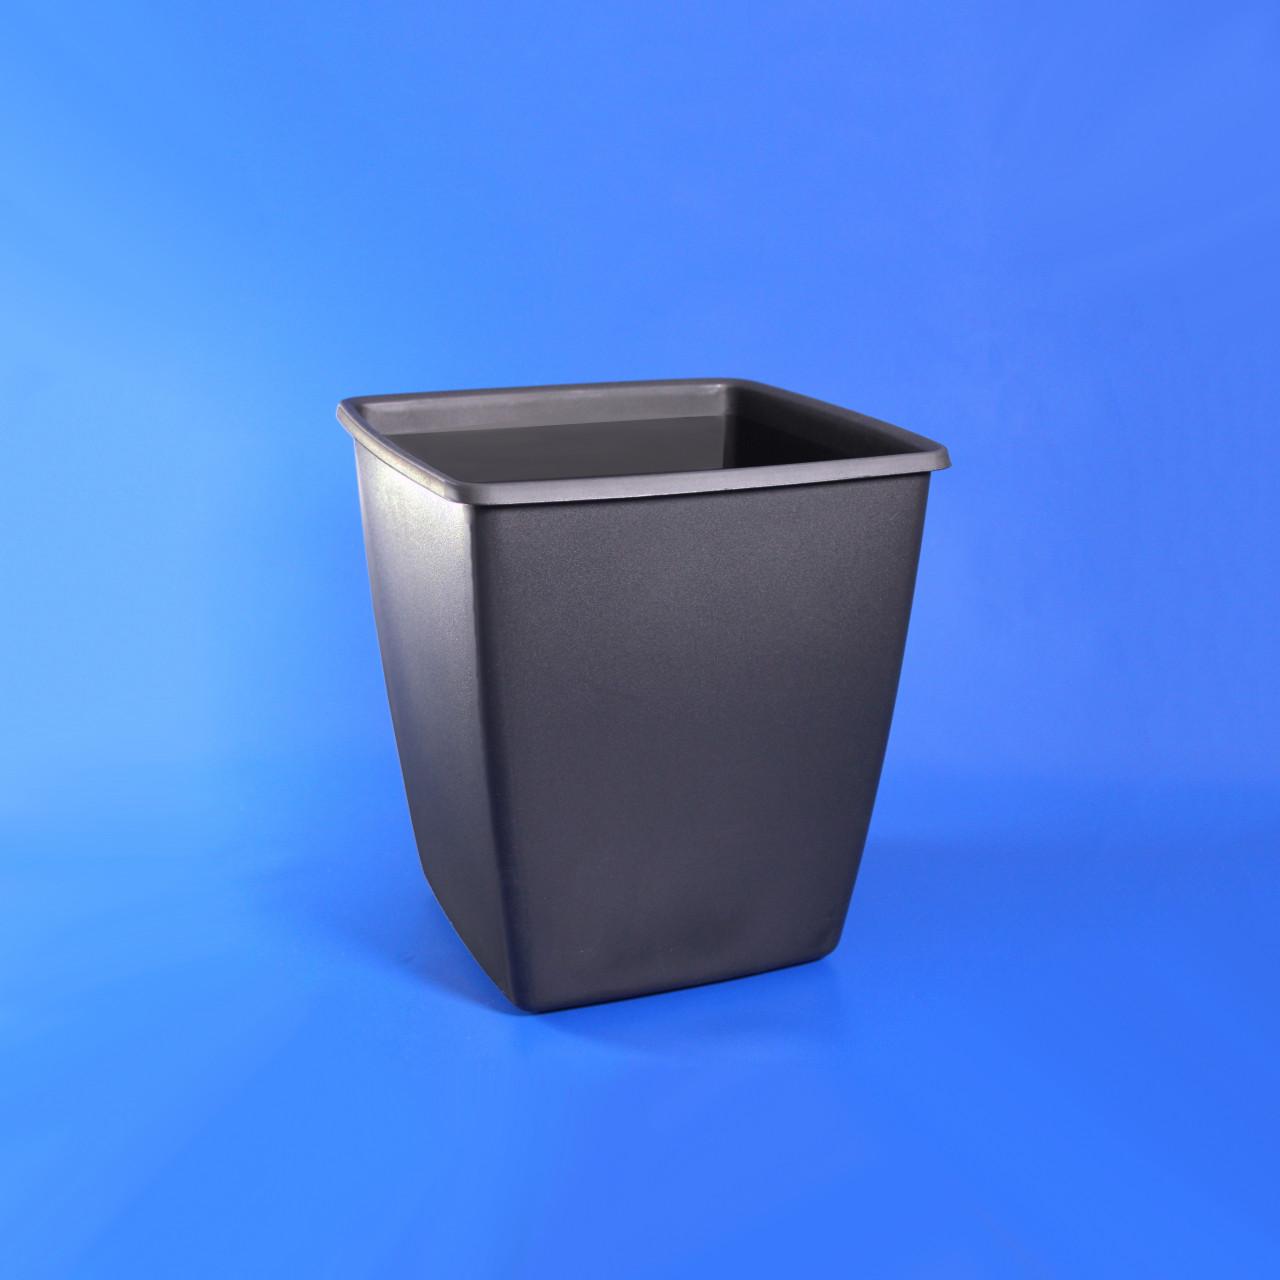 Papierkorb 18 Liter |300 x 300 x 320 mm